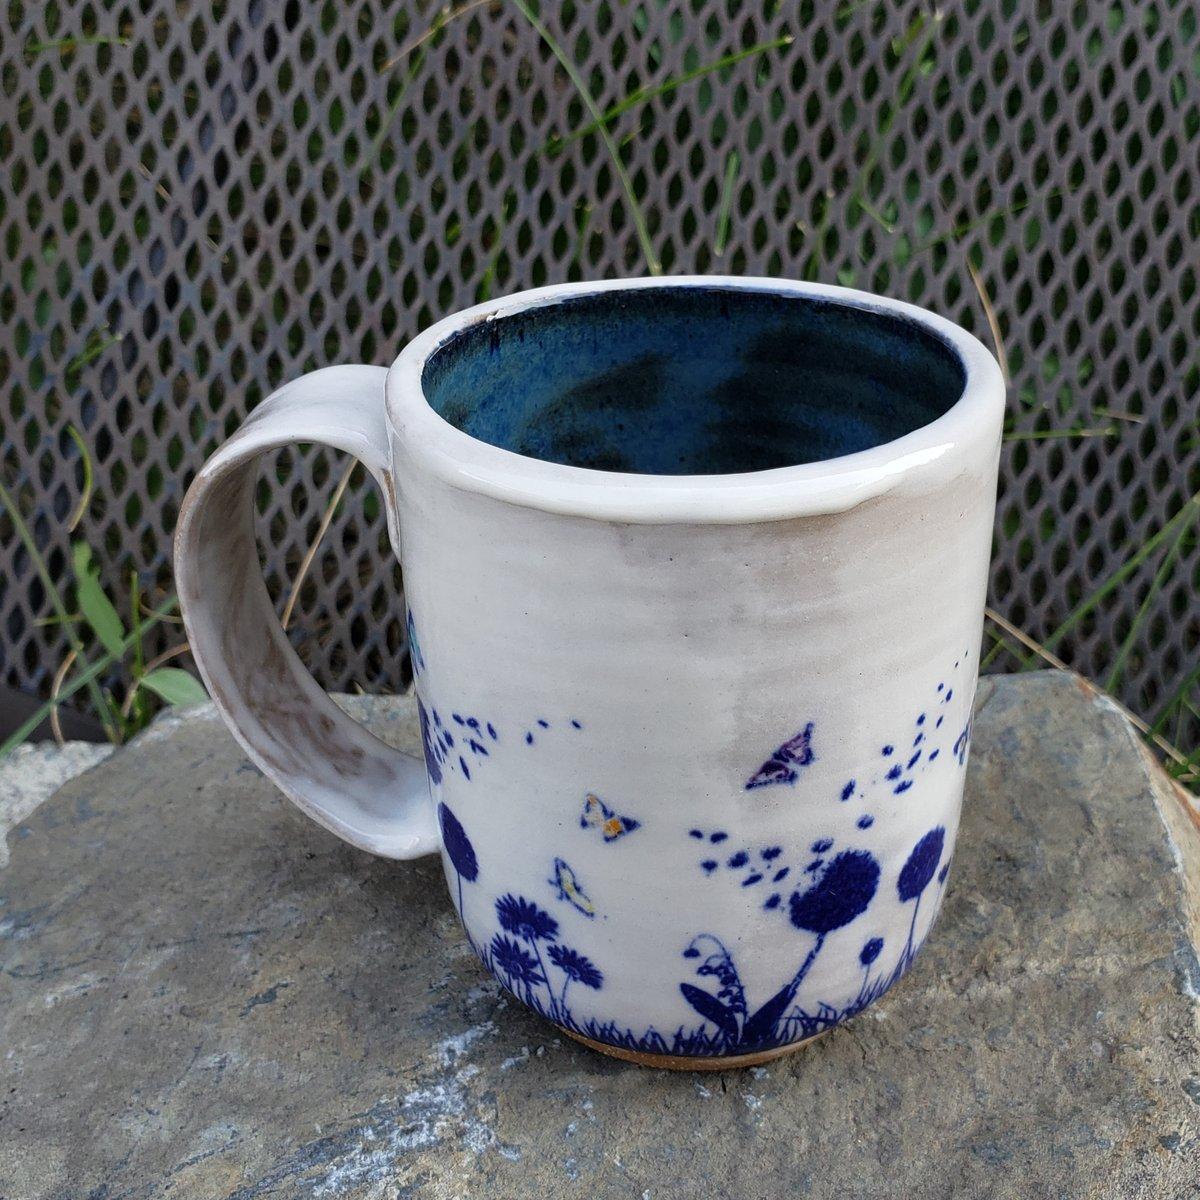 Image of Butterfly Friend Small Mug: Blue